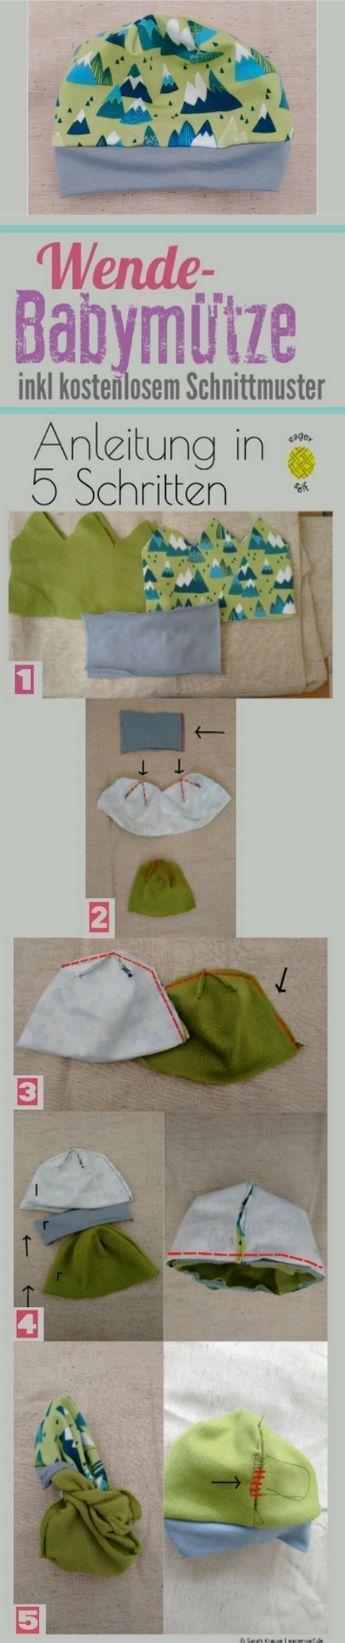 Baby Mütze Schnittanleitung Schnittmuster Gratis Baby #Anleitungen #Baby #B